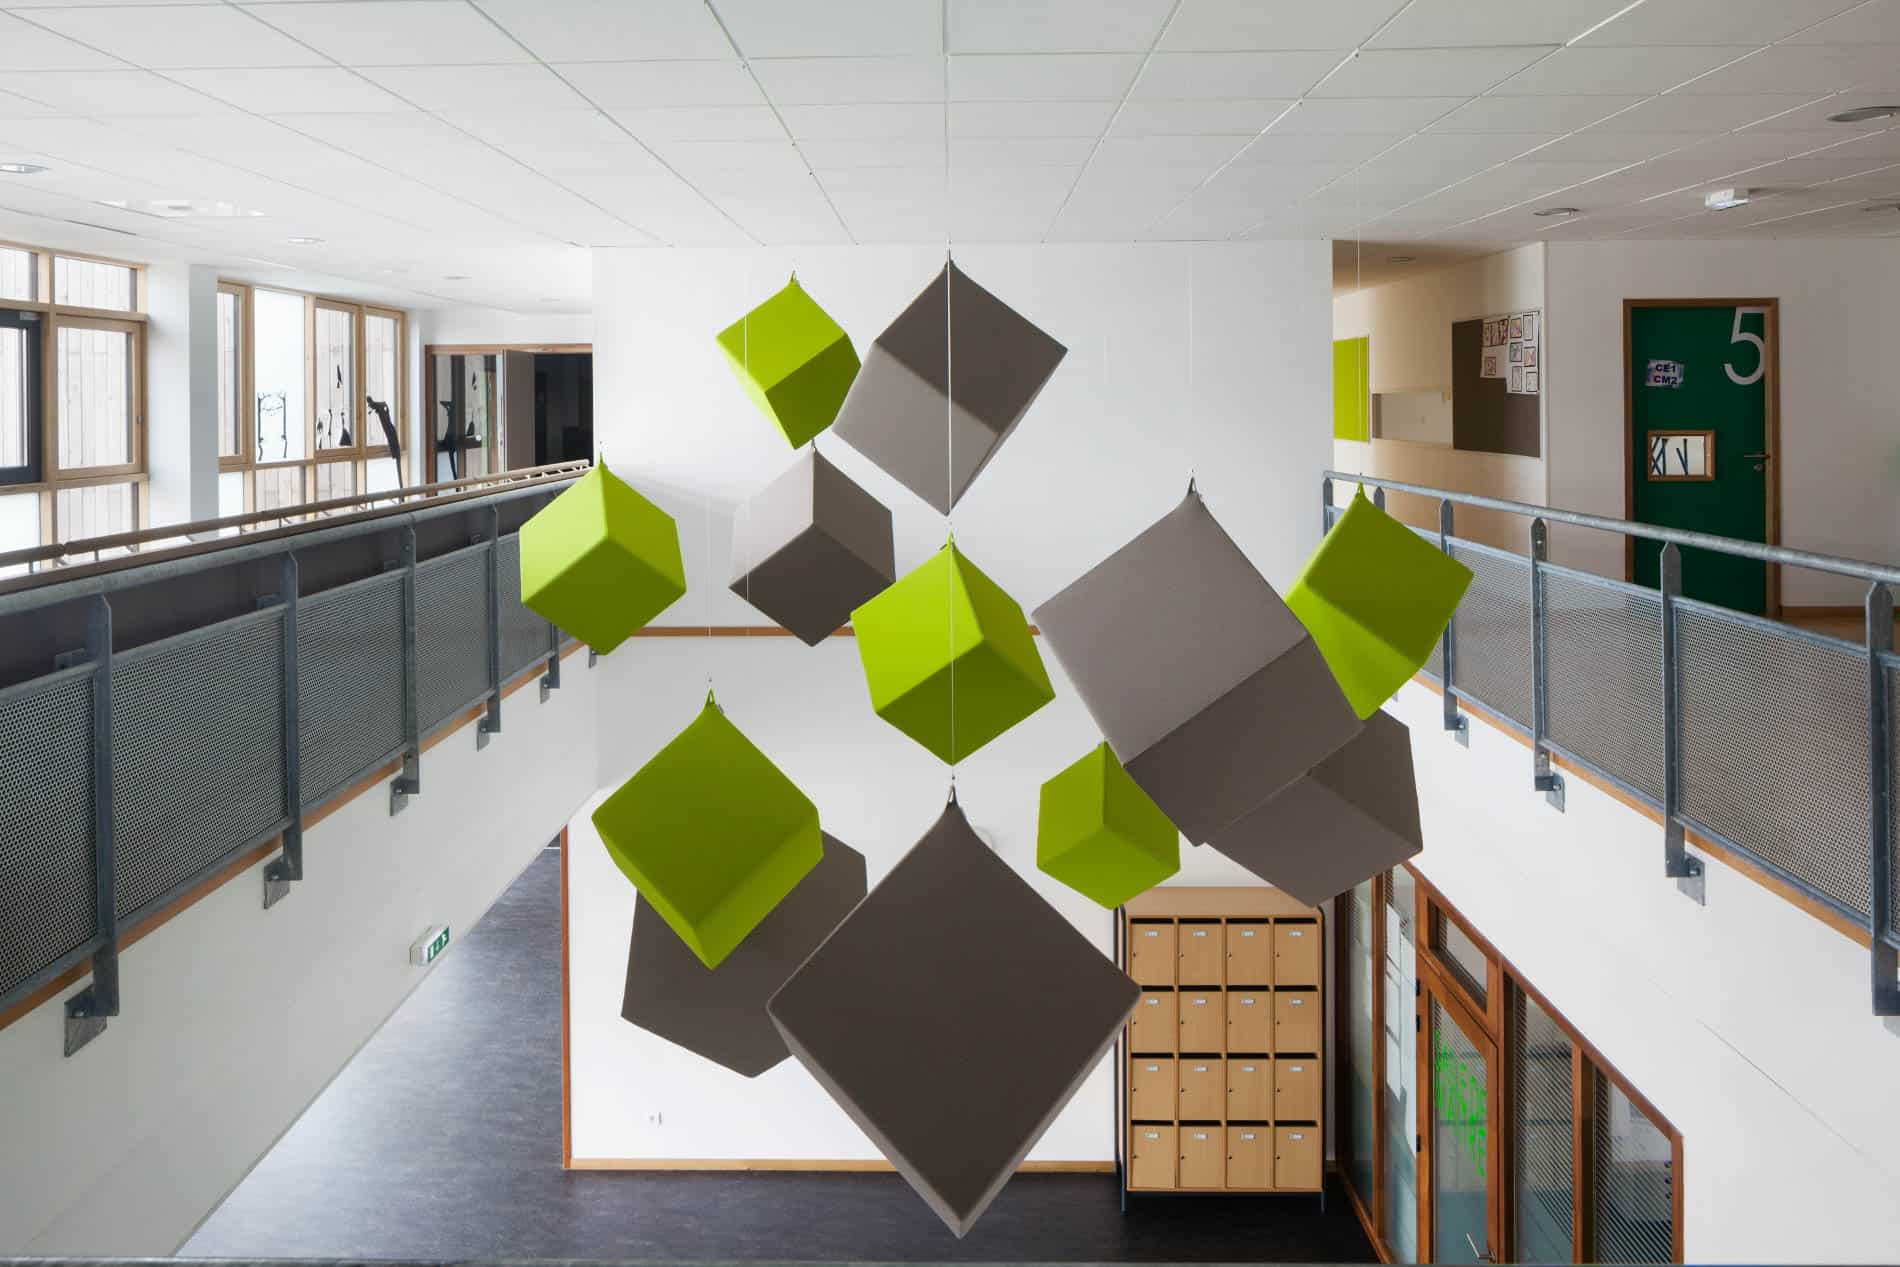 Texaa  Cubes Abso école Aimé Césaire Martignas-sur-Jalle  Arc